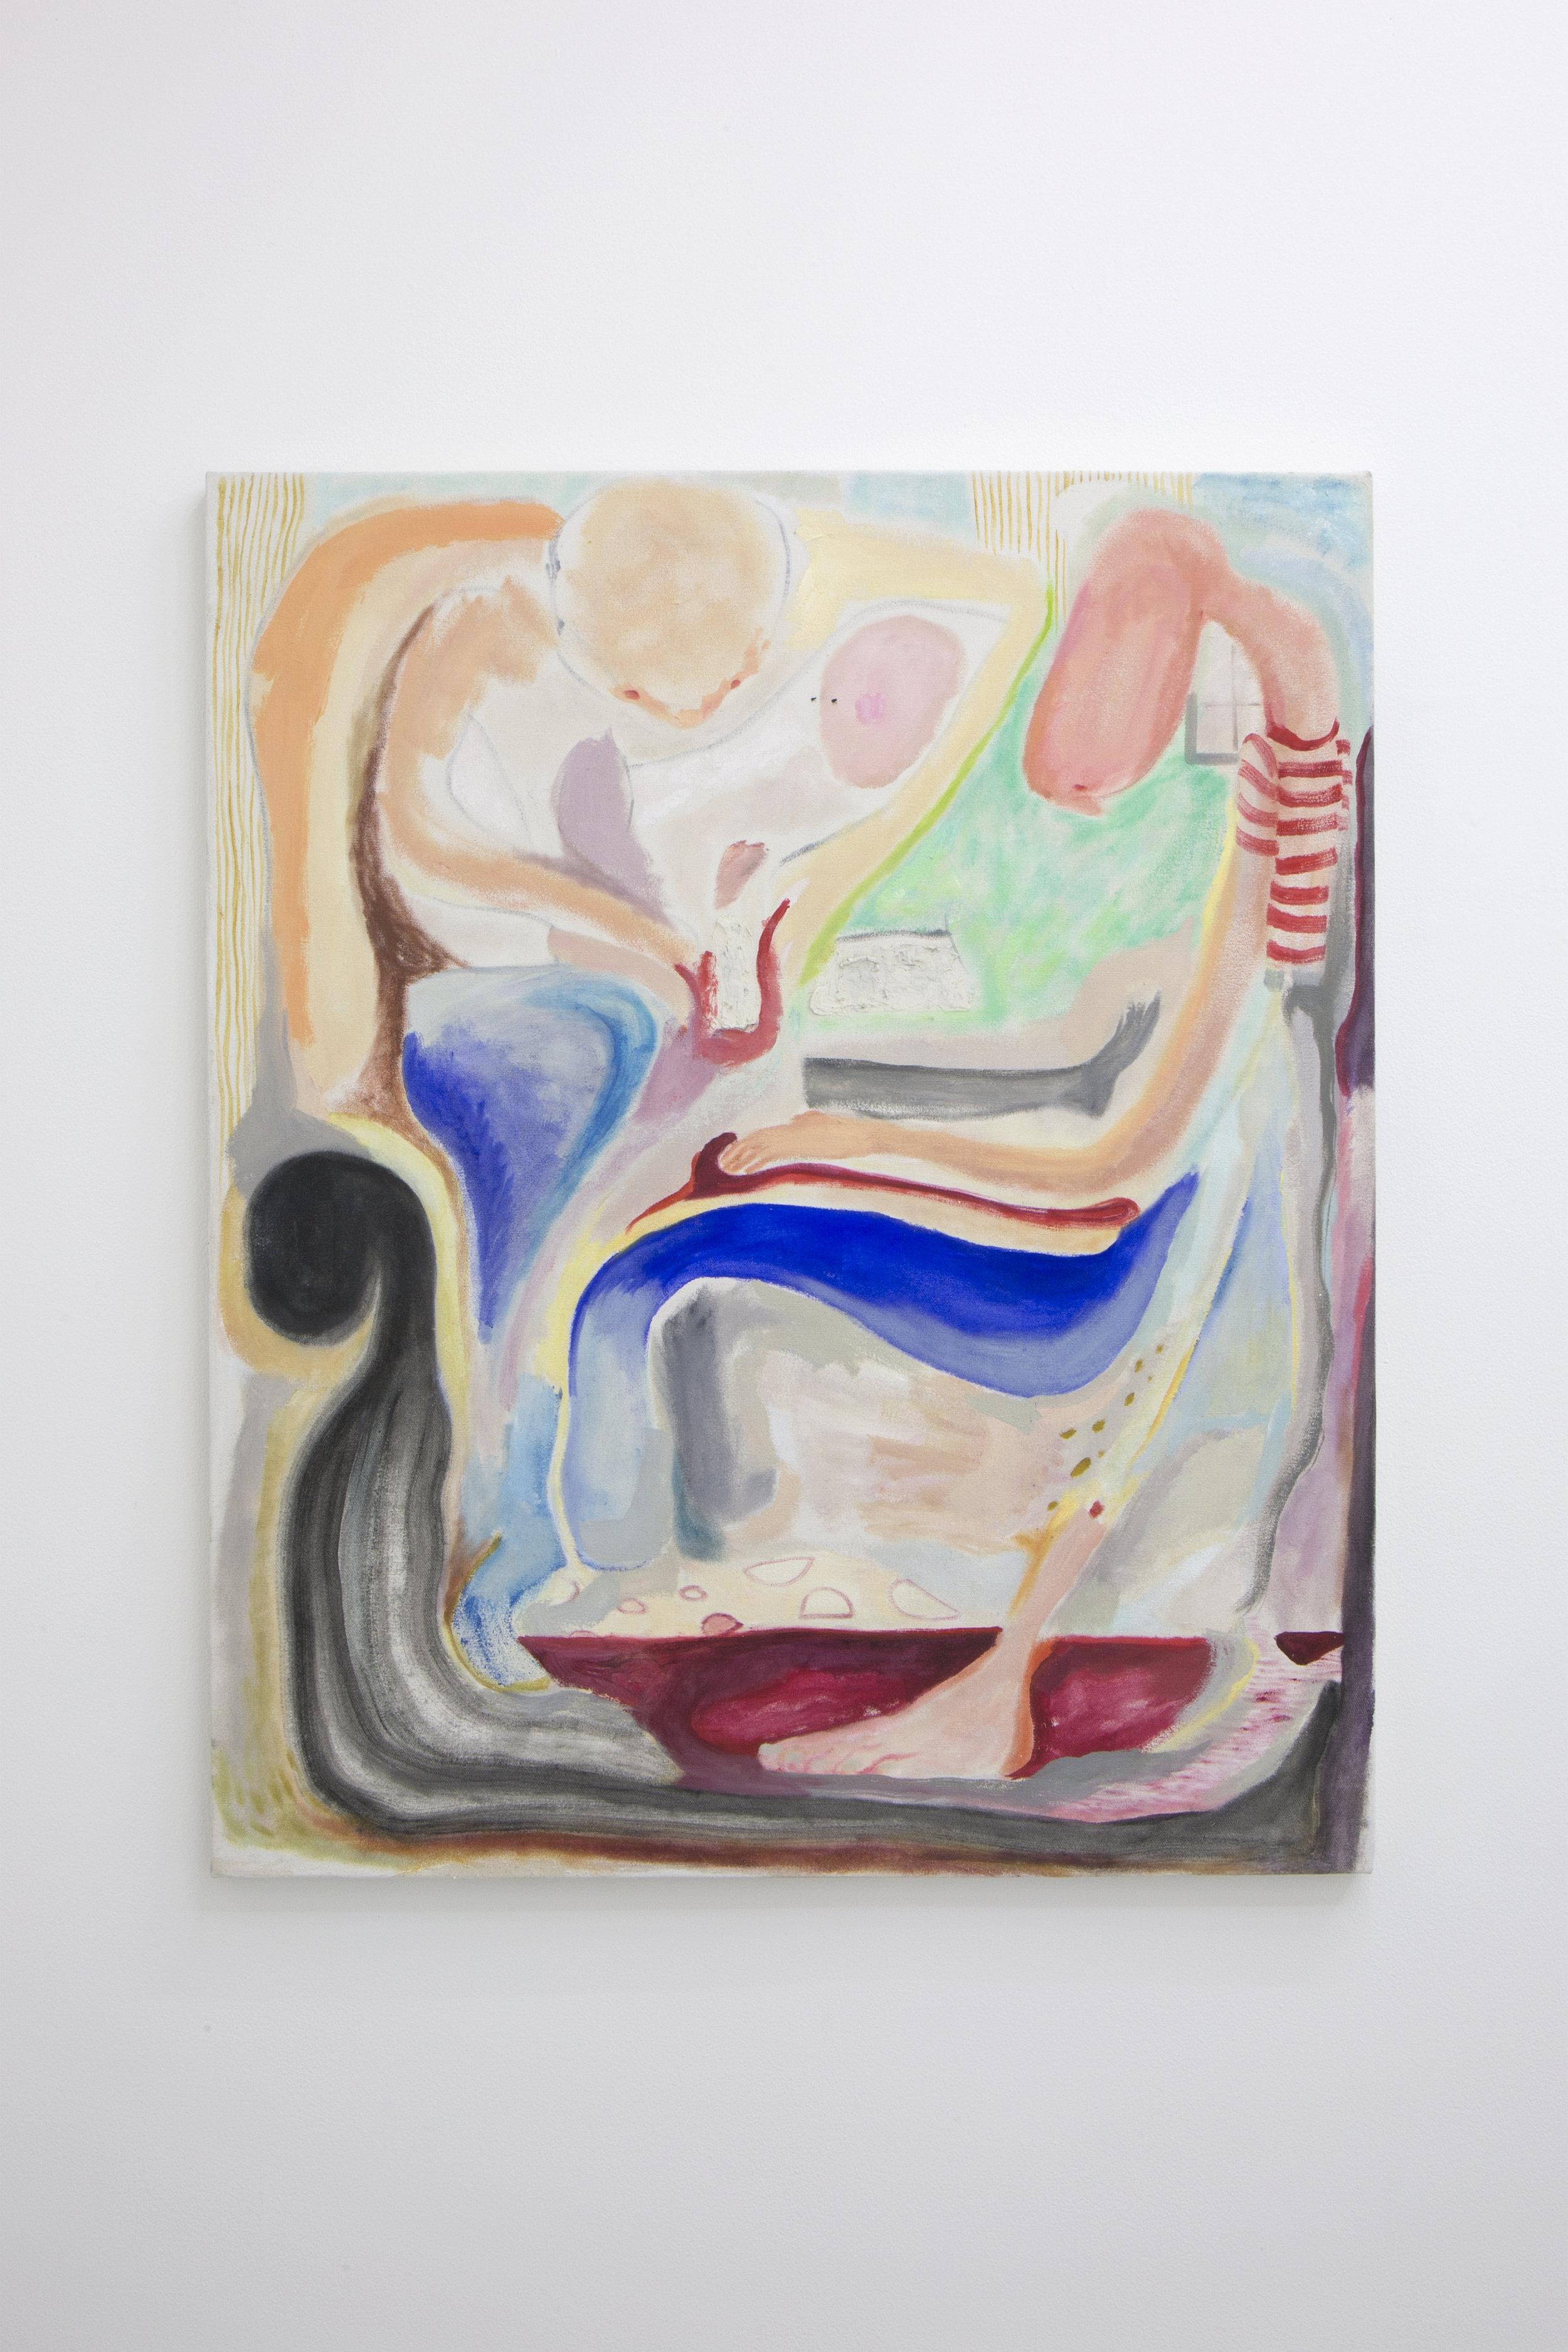 Lucía Vidales, Later (Ahorita), 2018.  Oil on canvas  84X71cm 33.07X 27.9528 inch